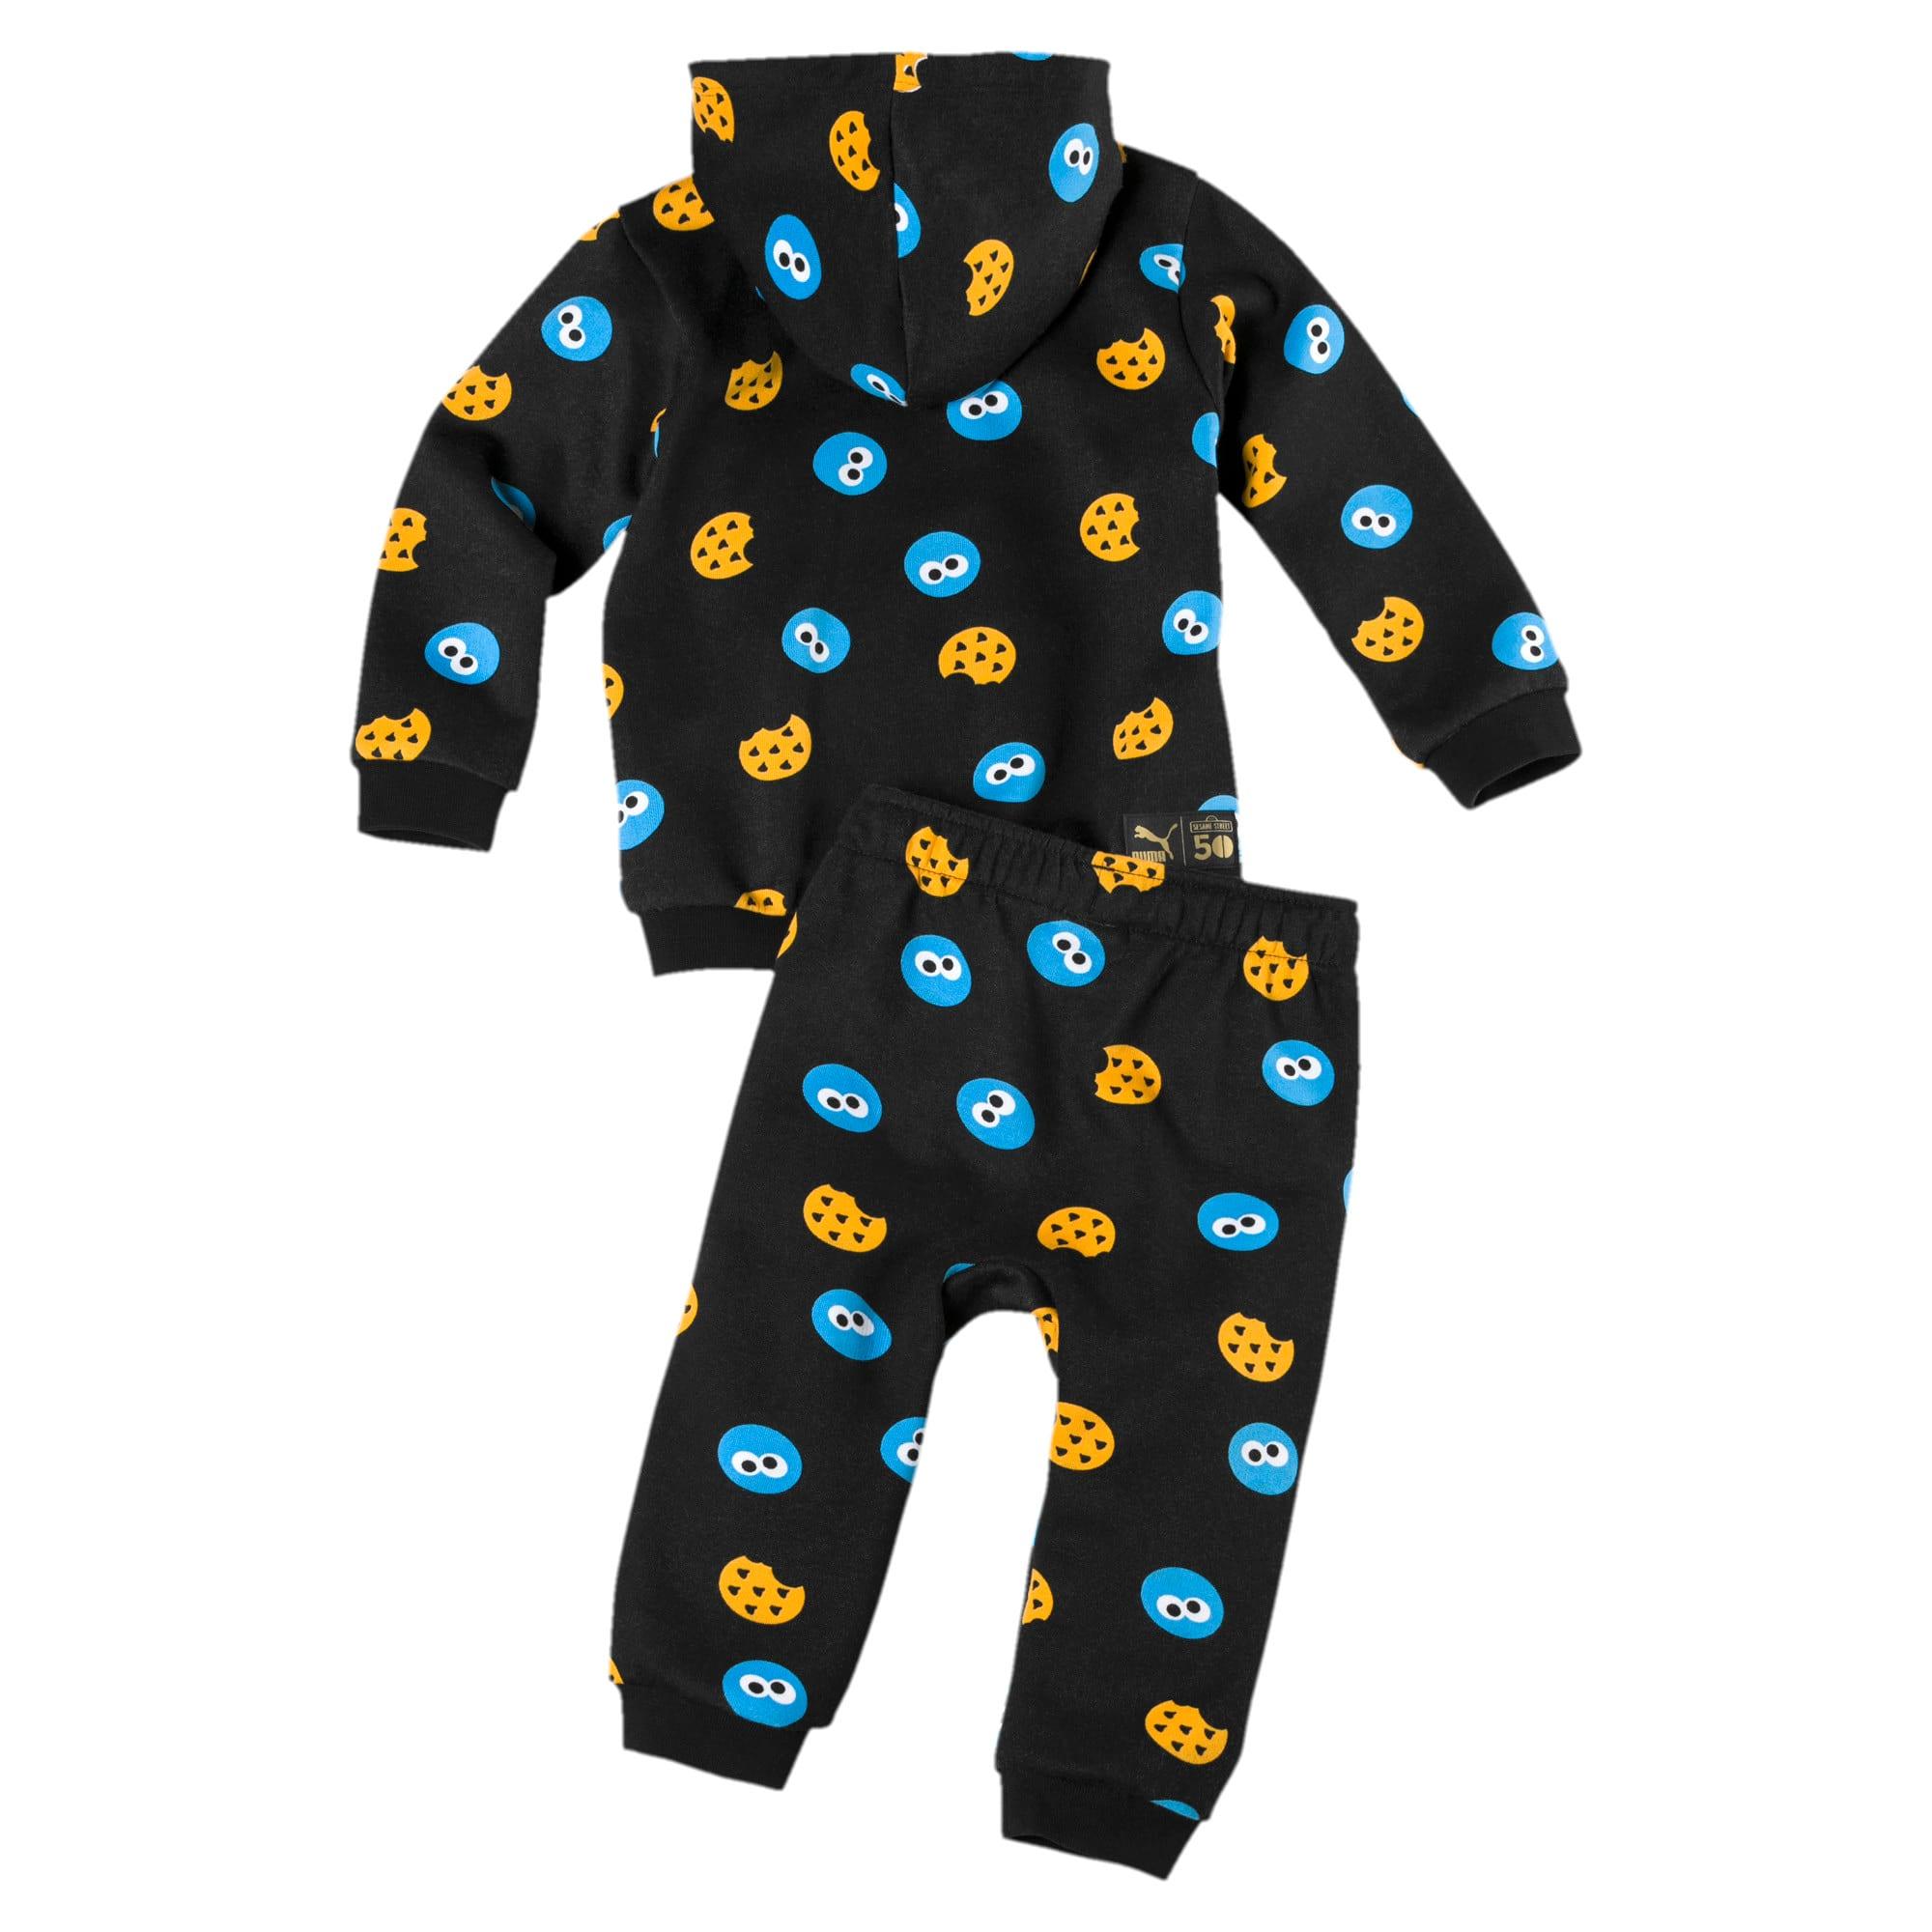 Thumbnail 2 of Sesame Street Graphic Babies' Jogger Set, Puma Black, medium